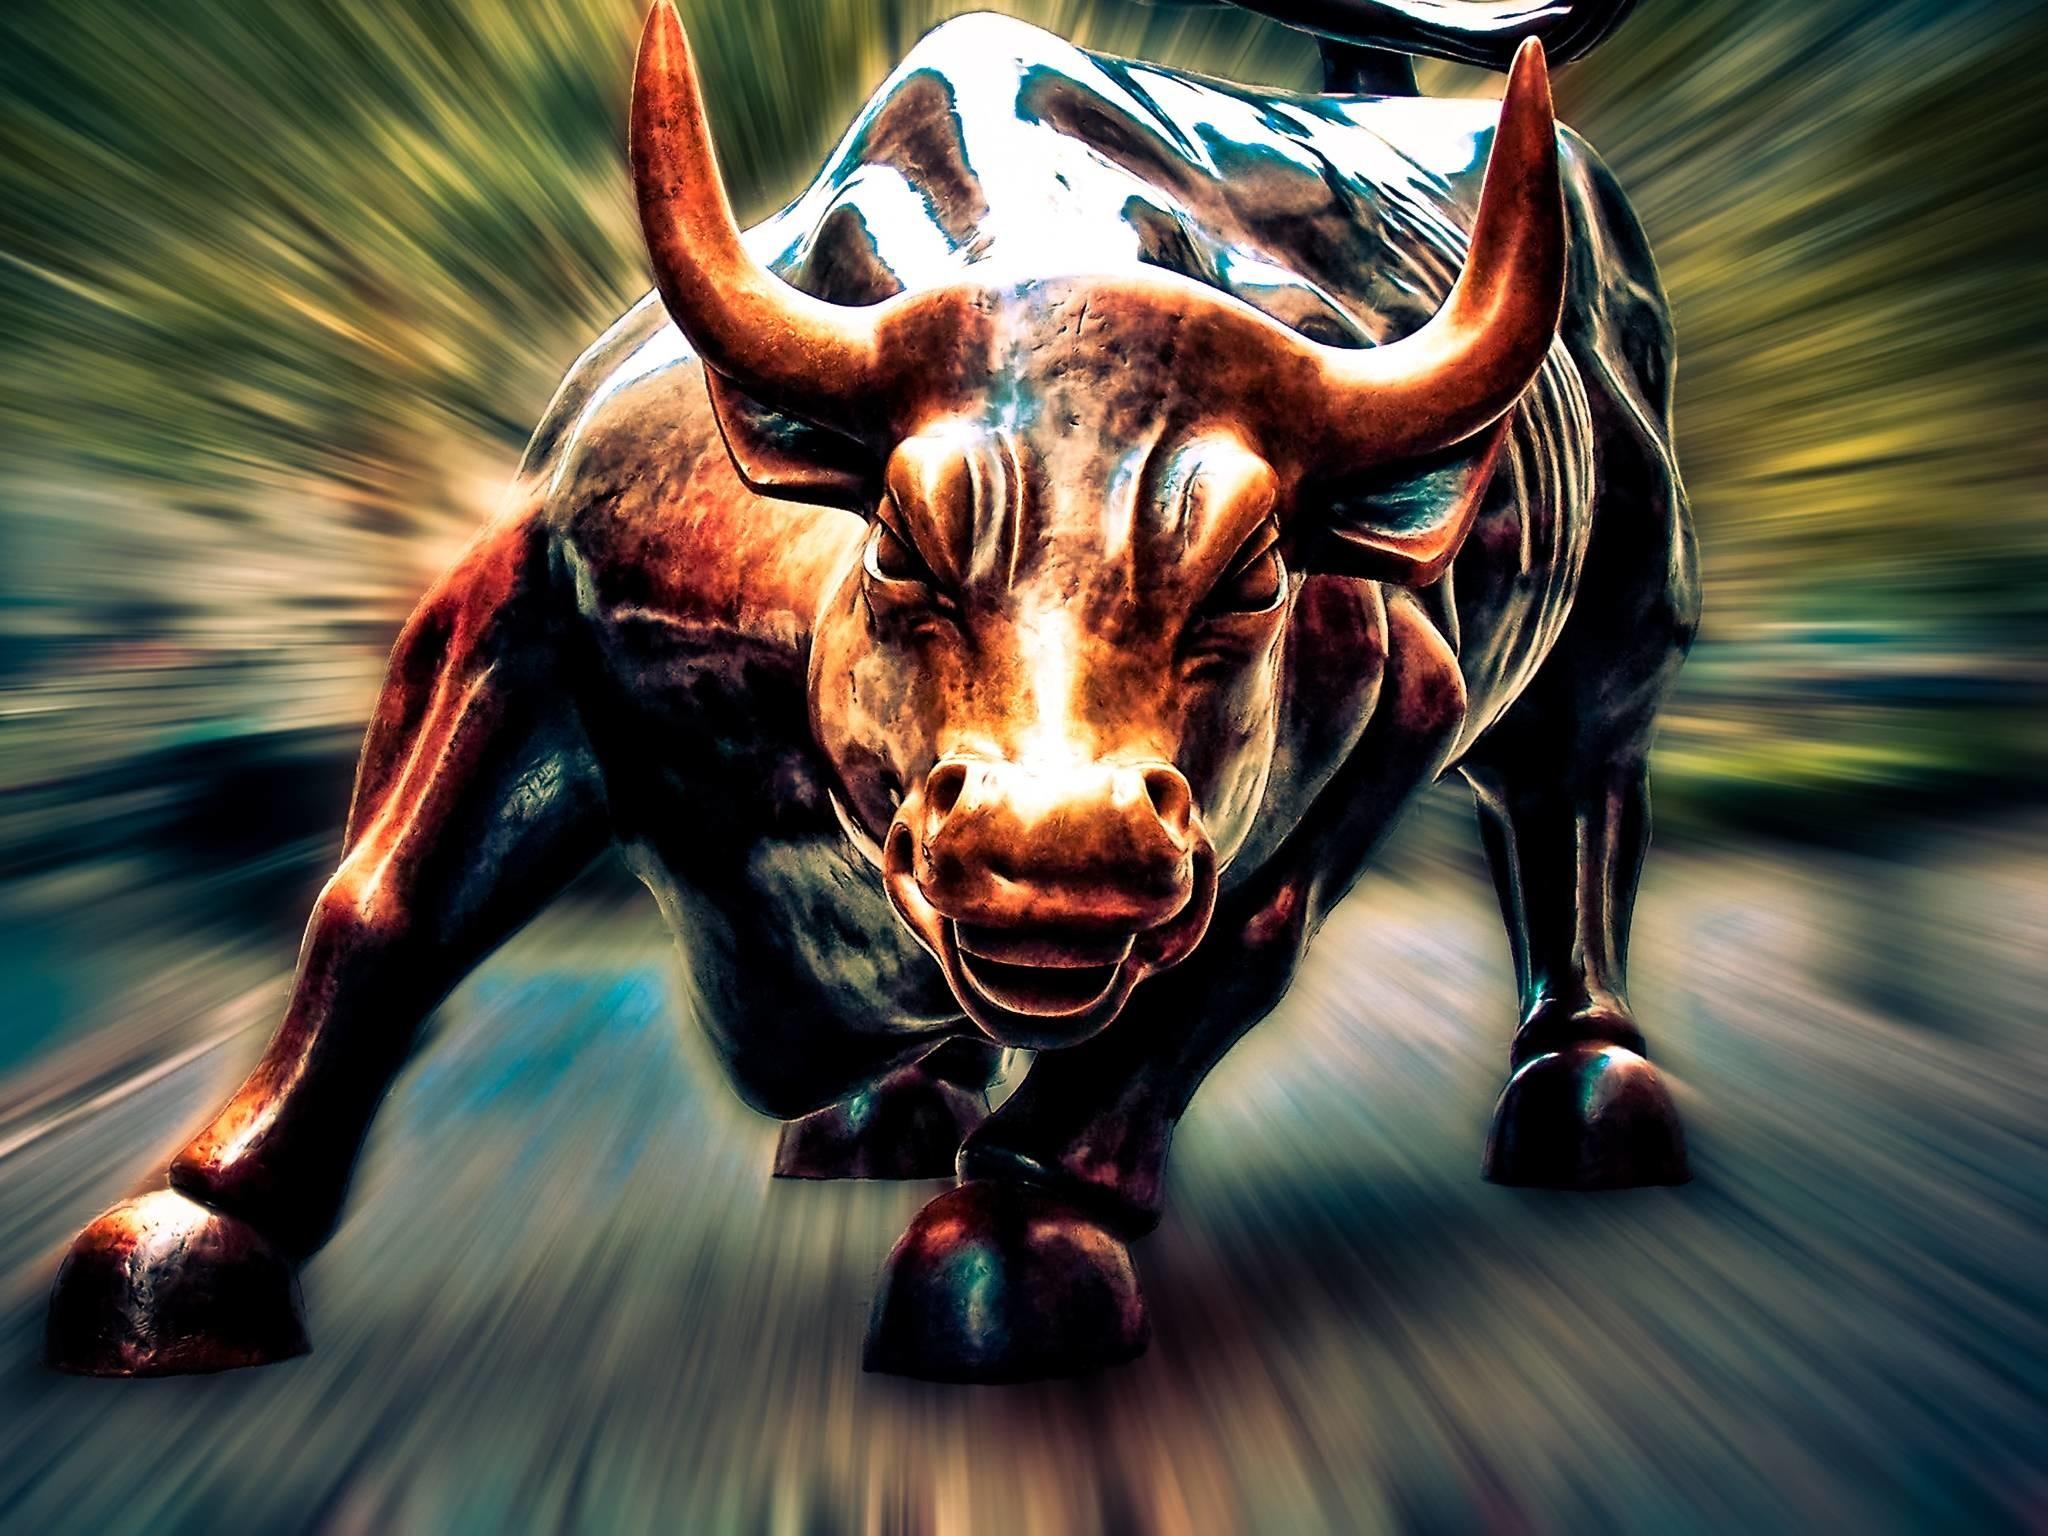 Wall Street Bull Wallpaper   vergapipe.